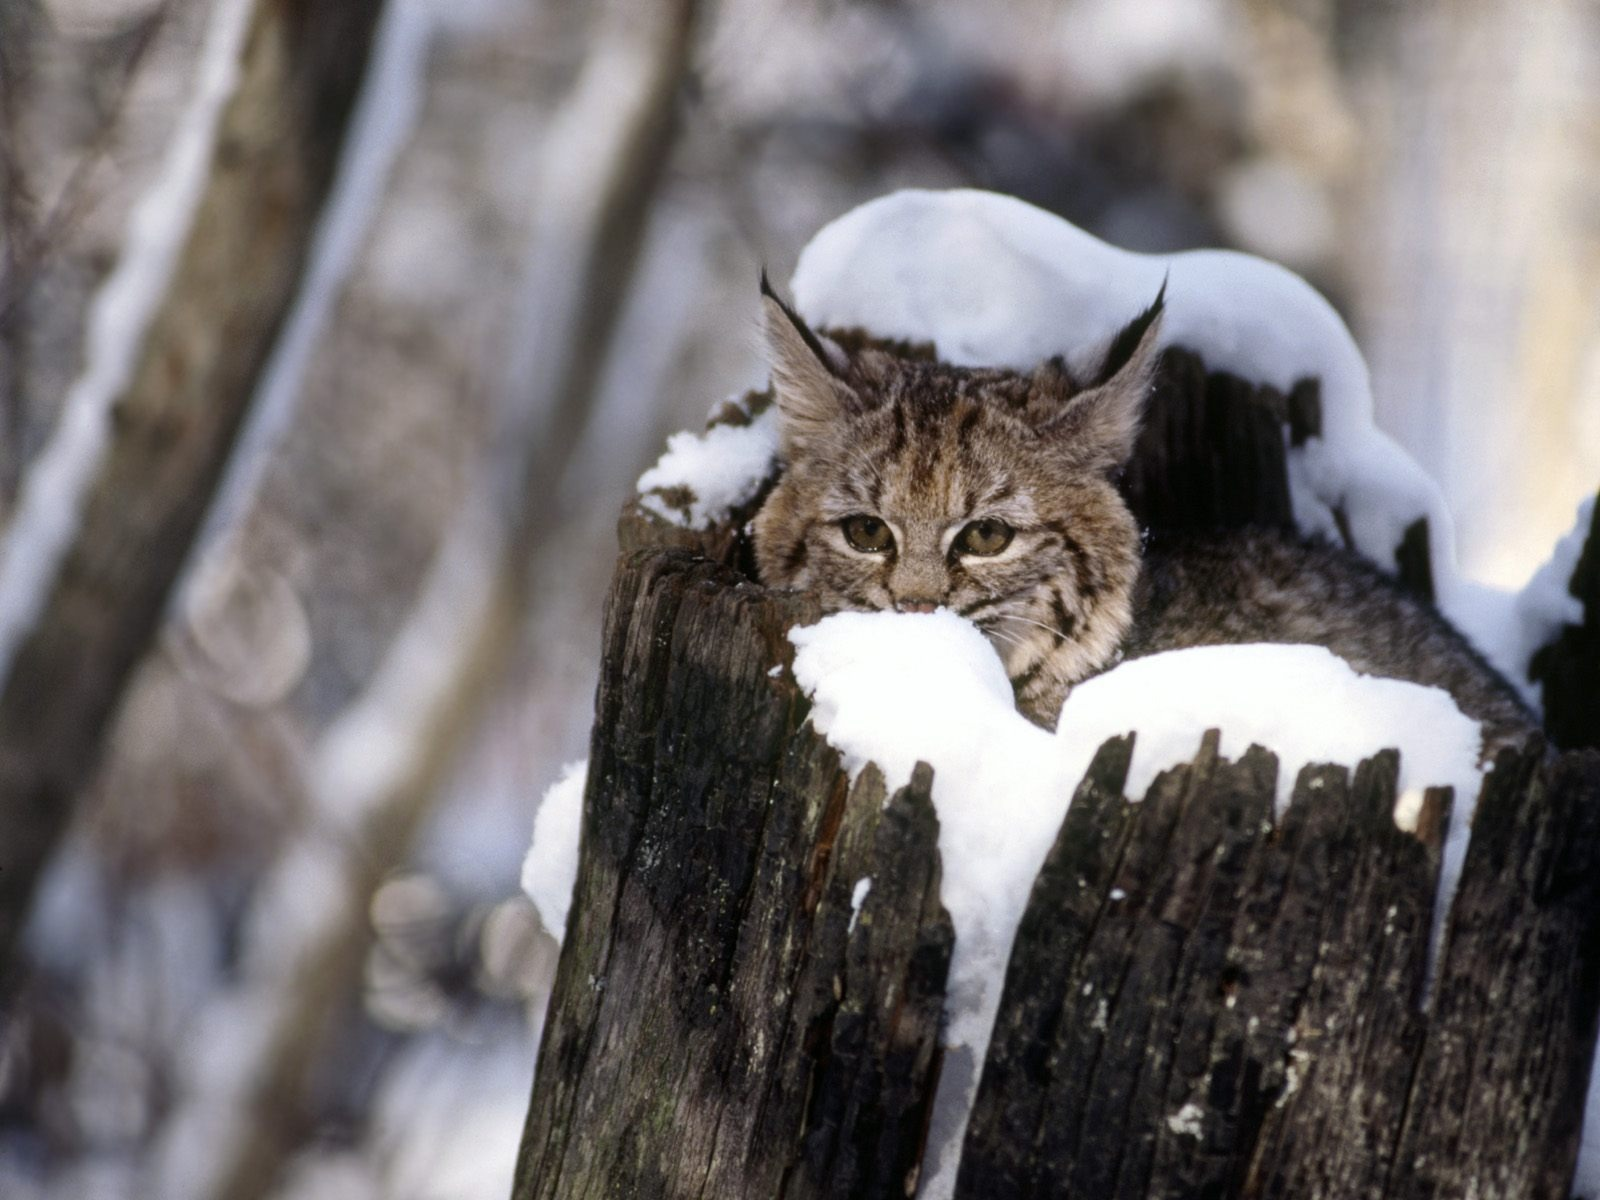 Snow cats kittens funny animals fondo upscaled wallpaper ...